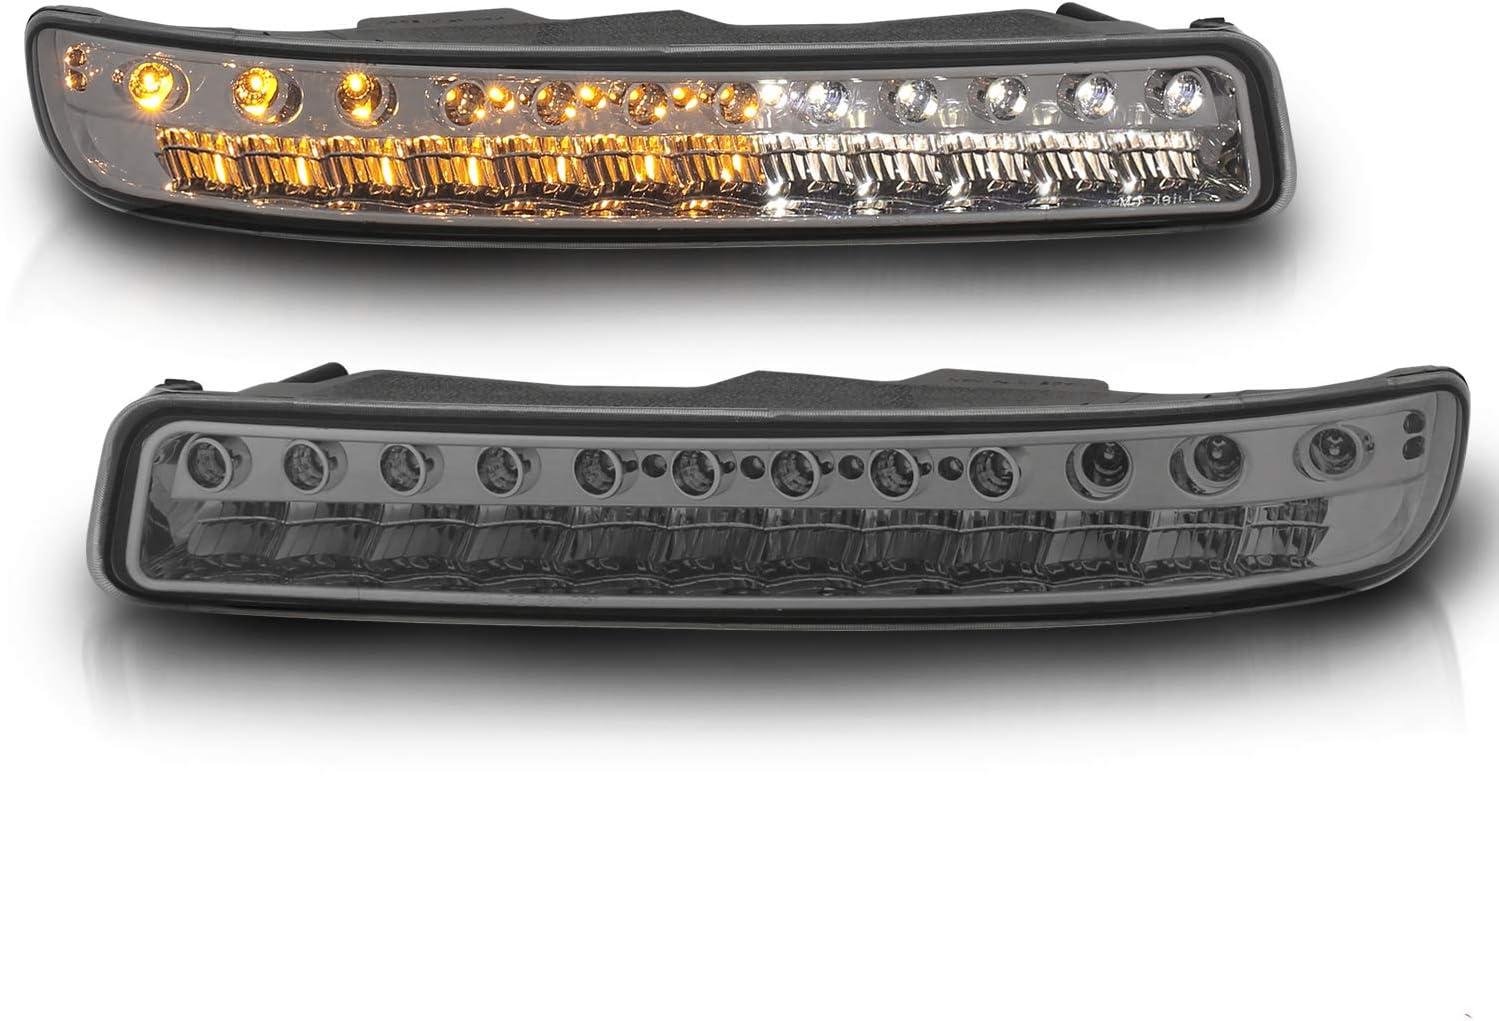 Passenger and Driver Side AmeriLite Smoke LED Parking Turn Signal Lights Replacement Set for G.M.C Sierra//Yukon